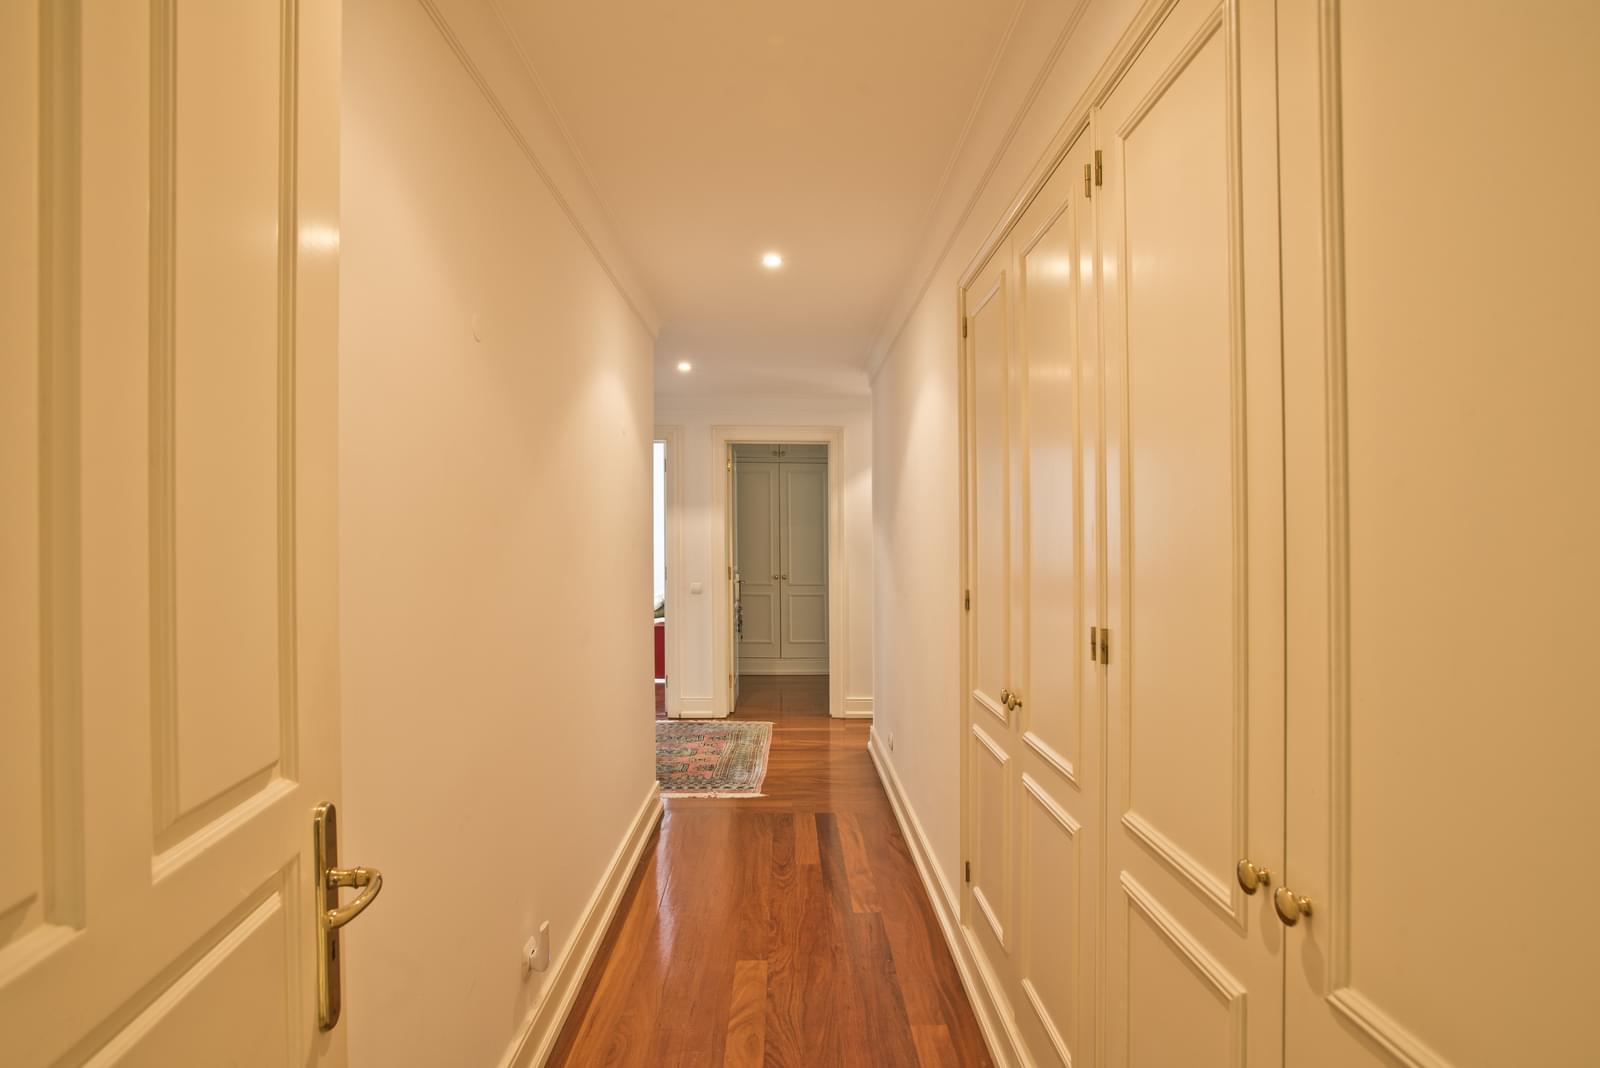 pf17005-apartamento-t4-1-cascais-ba1e09dd-0044-4a20-89eb-a6d64b27f708